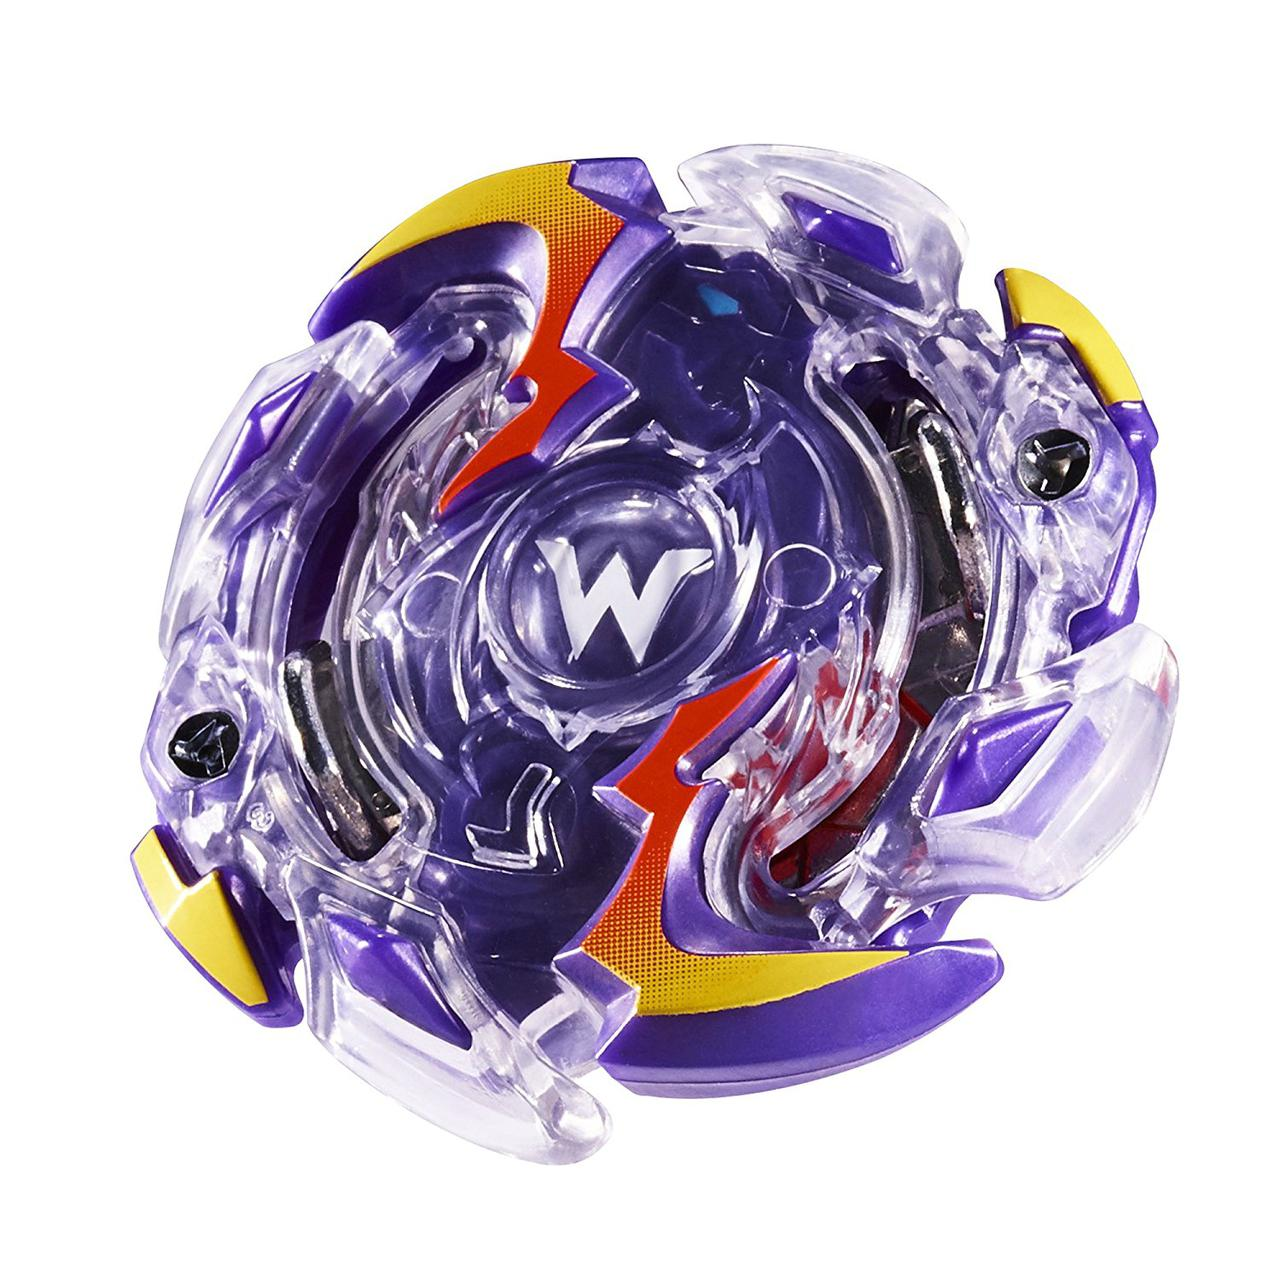 Бейблейд волчок Вайврон с пусковым устройством Beyblade Burst Starter Pack Wyvron W2 оригинал HASBRO